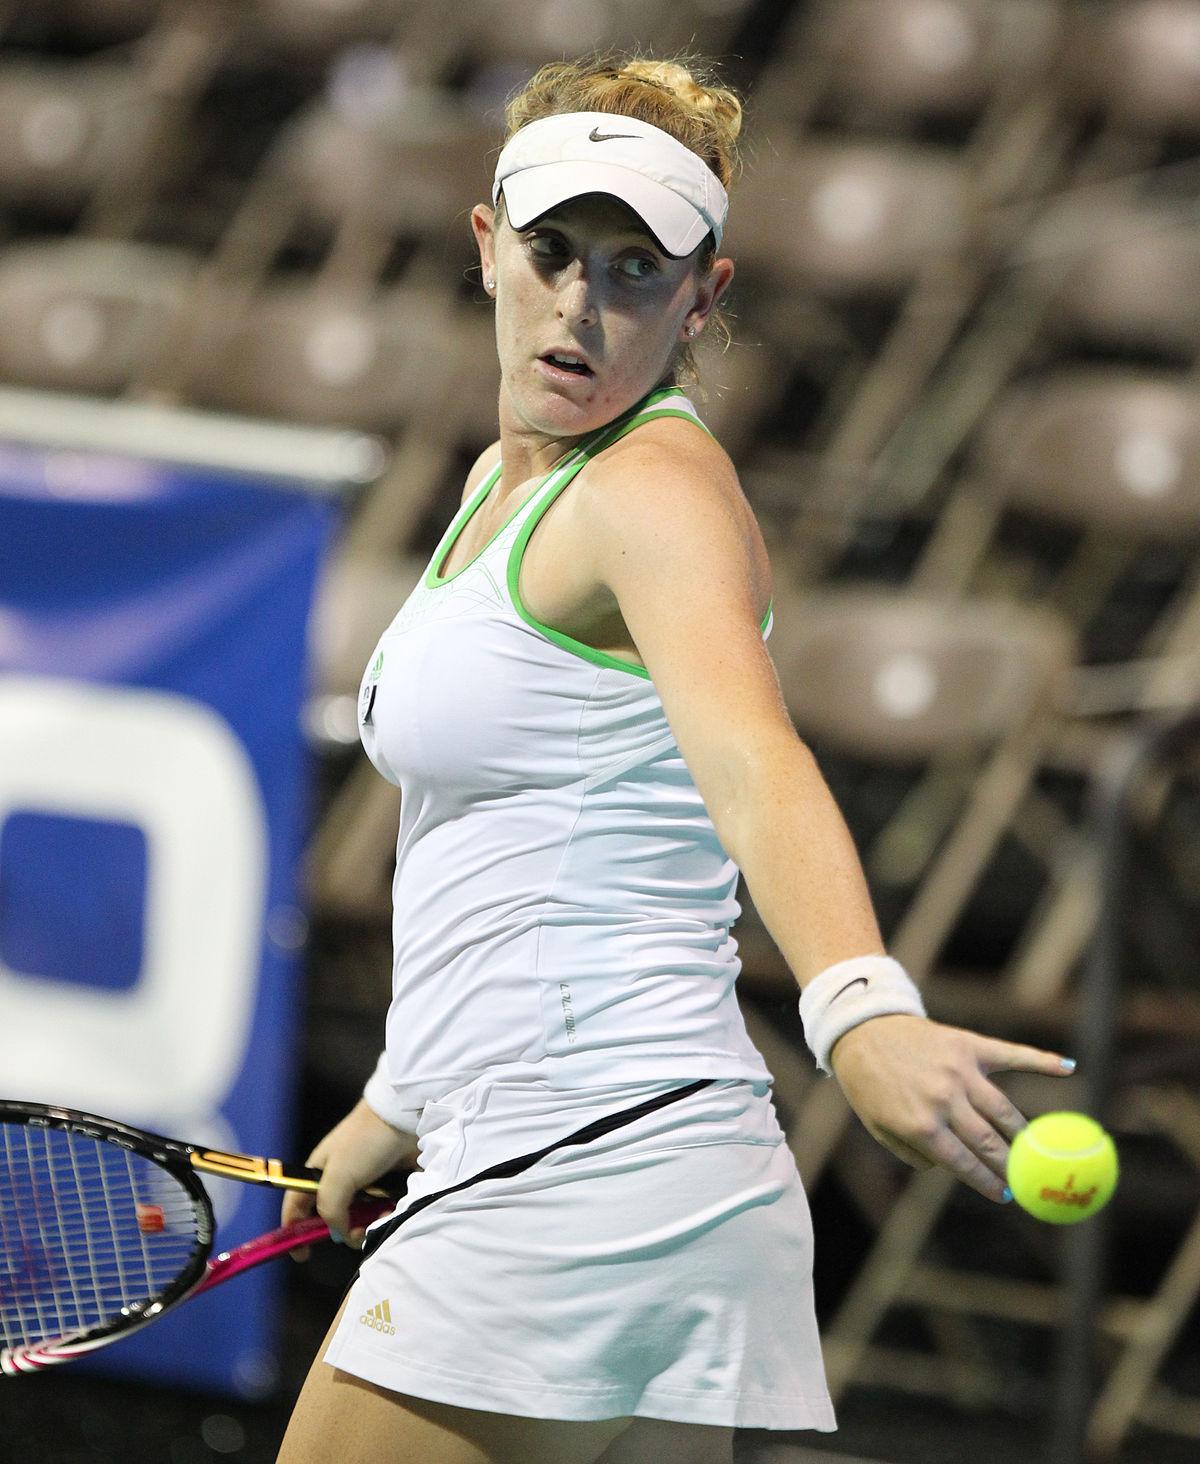 us womens amateur tennis ranking jpg 422x640